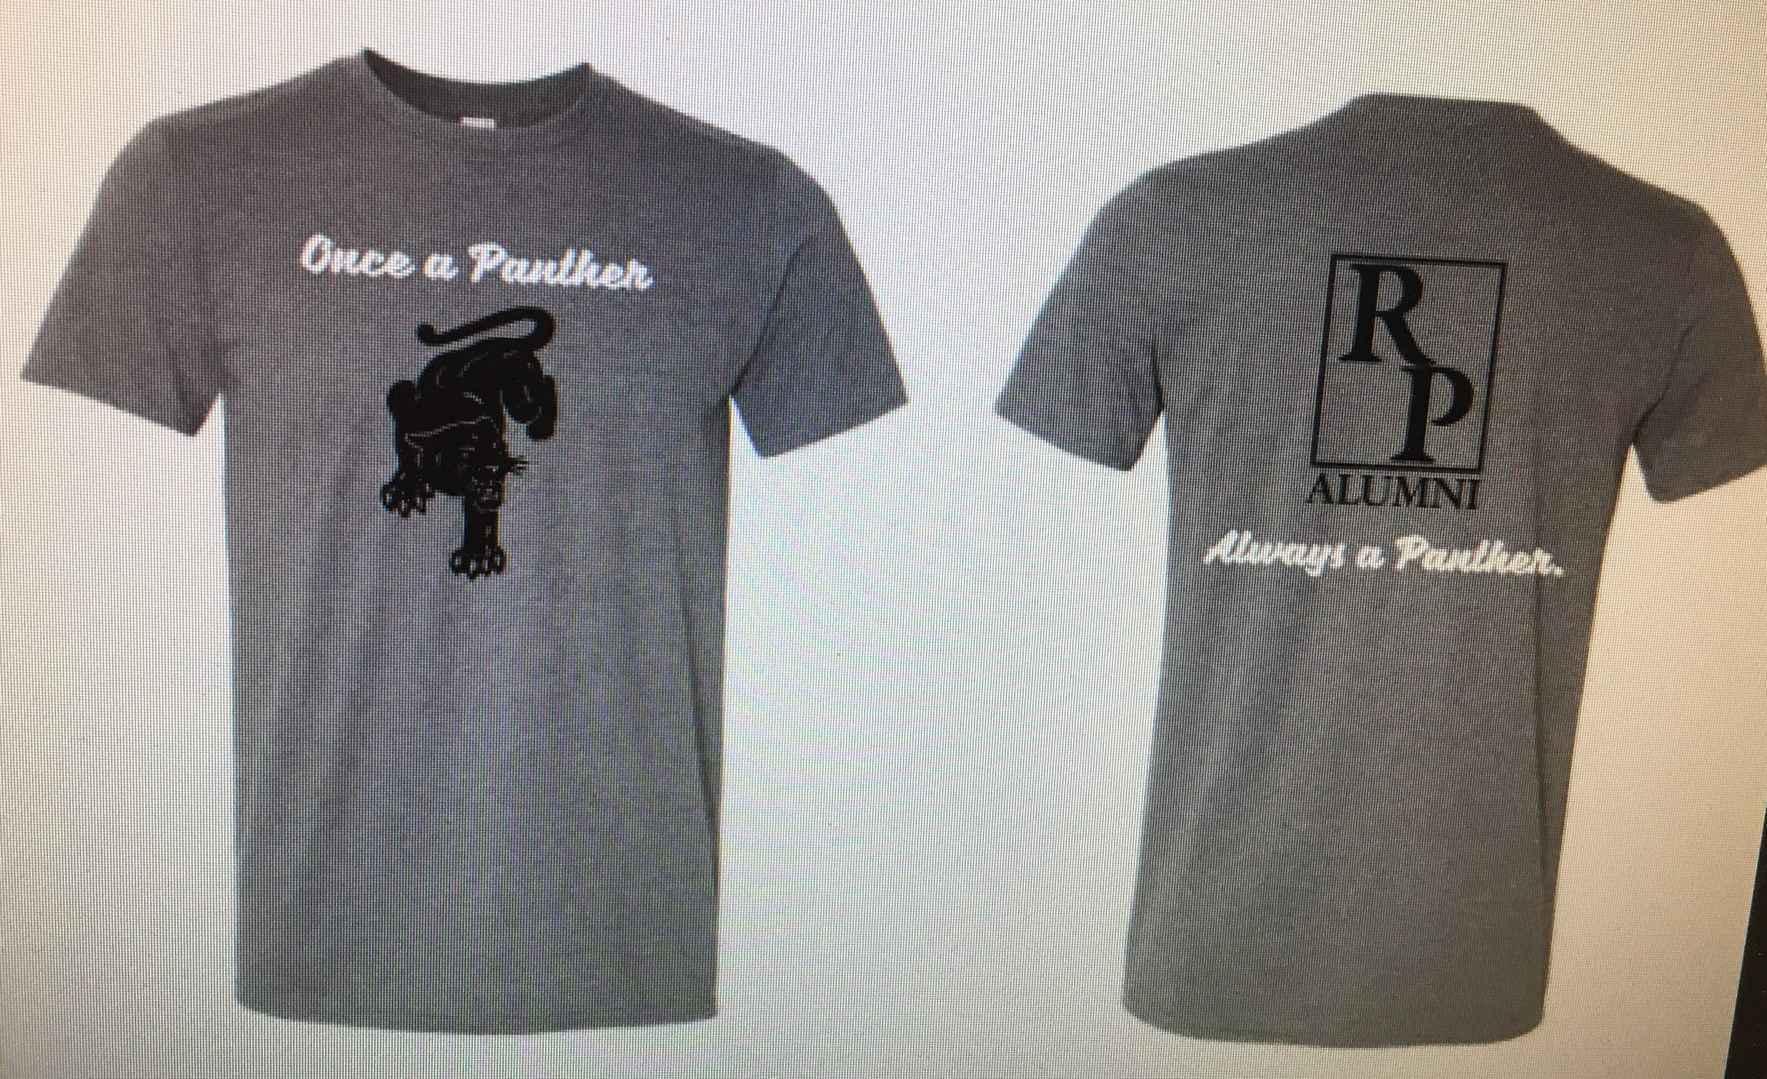 Ray-Pec Alumni T-shirt Package image